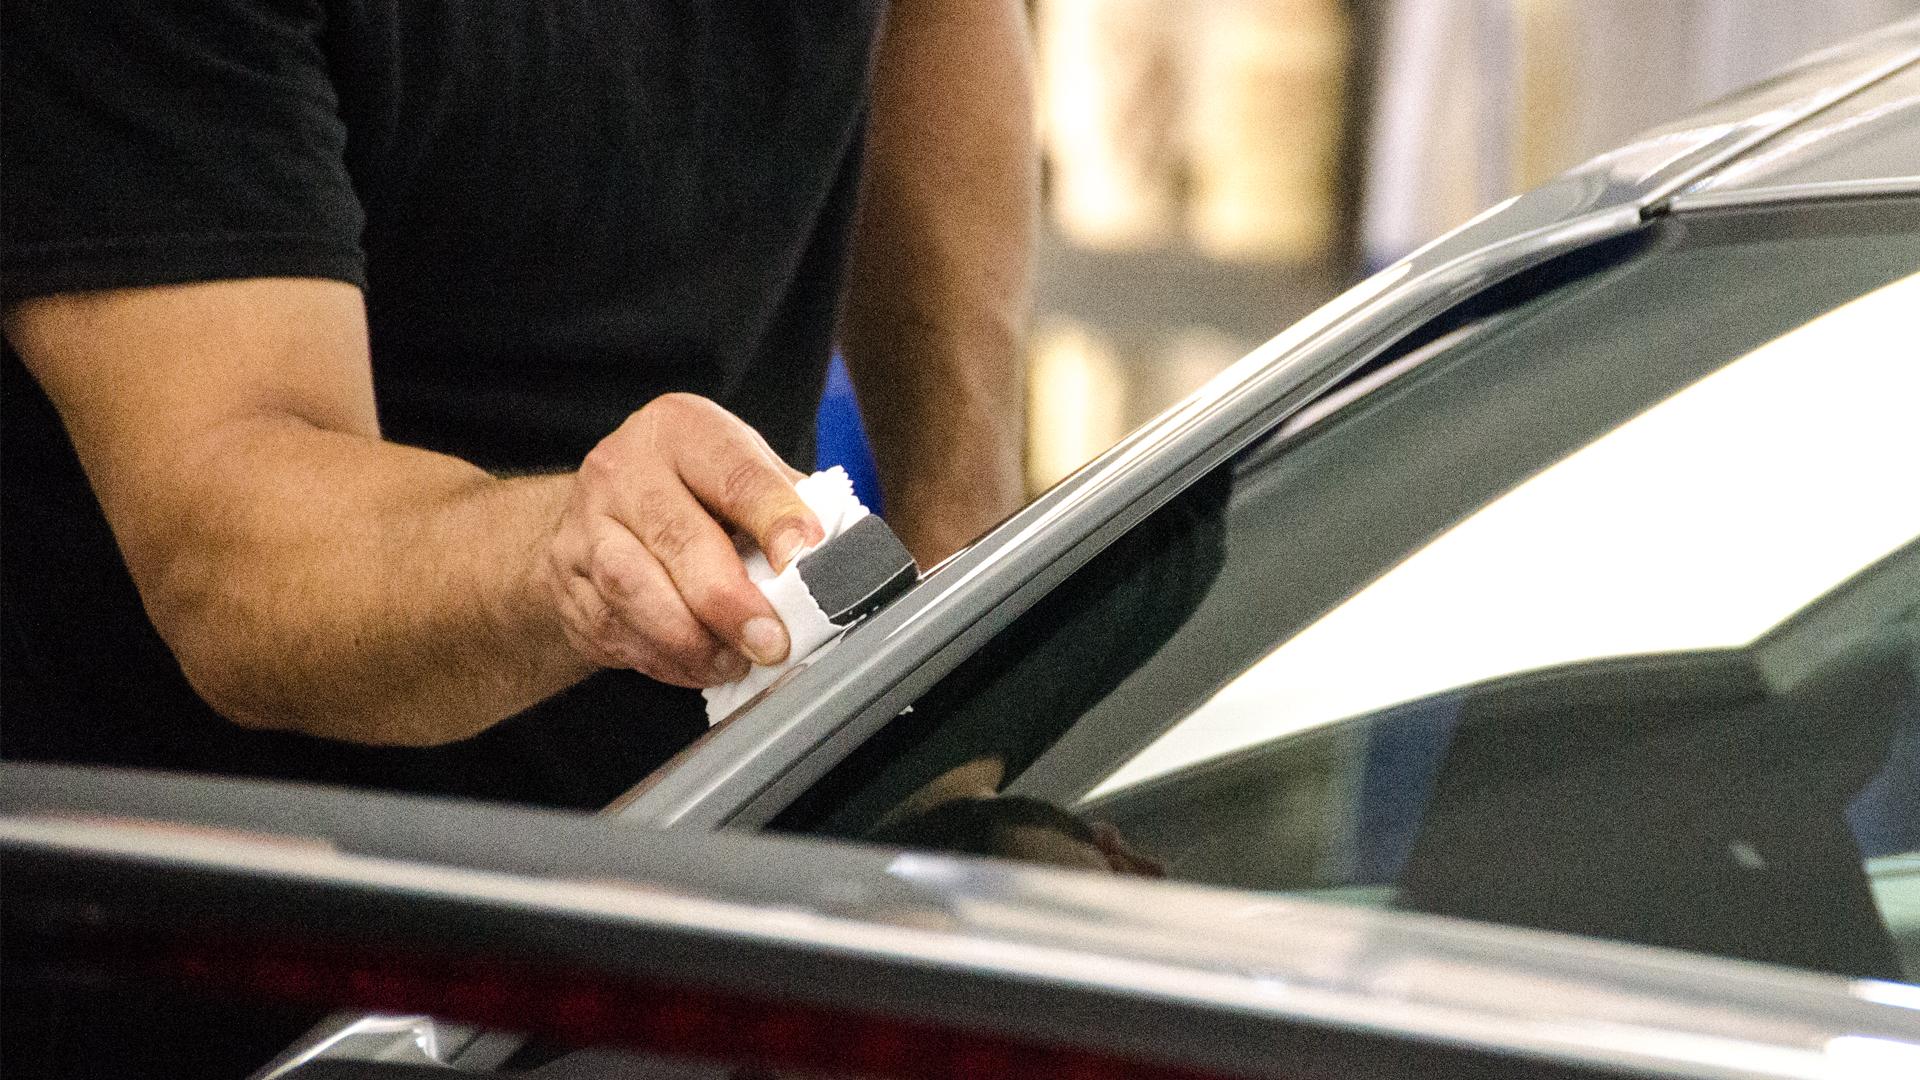 nanotech paint sealant protection